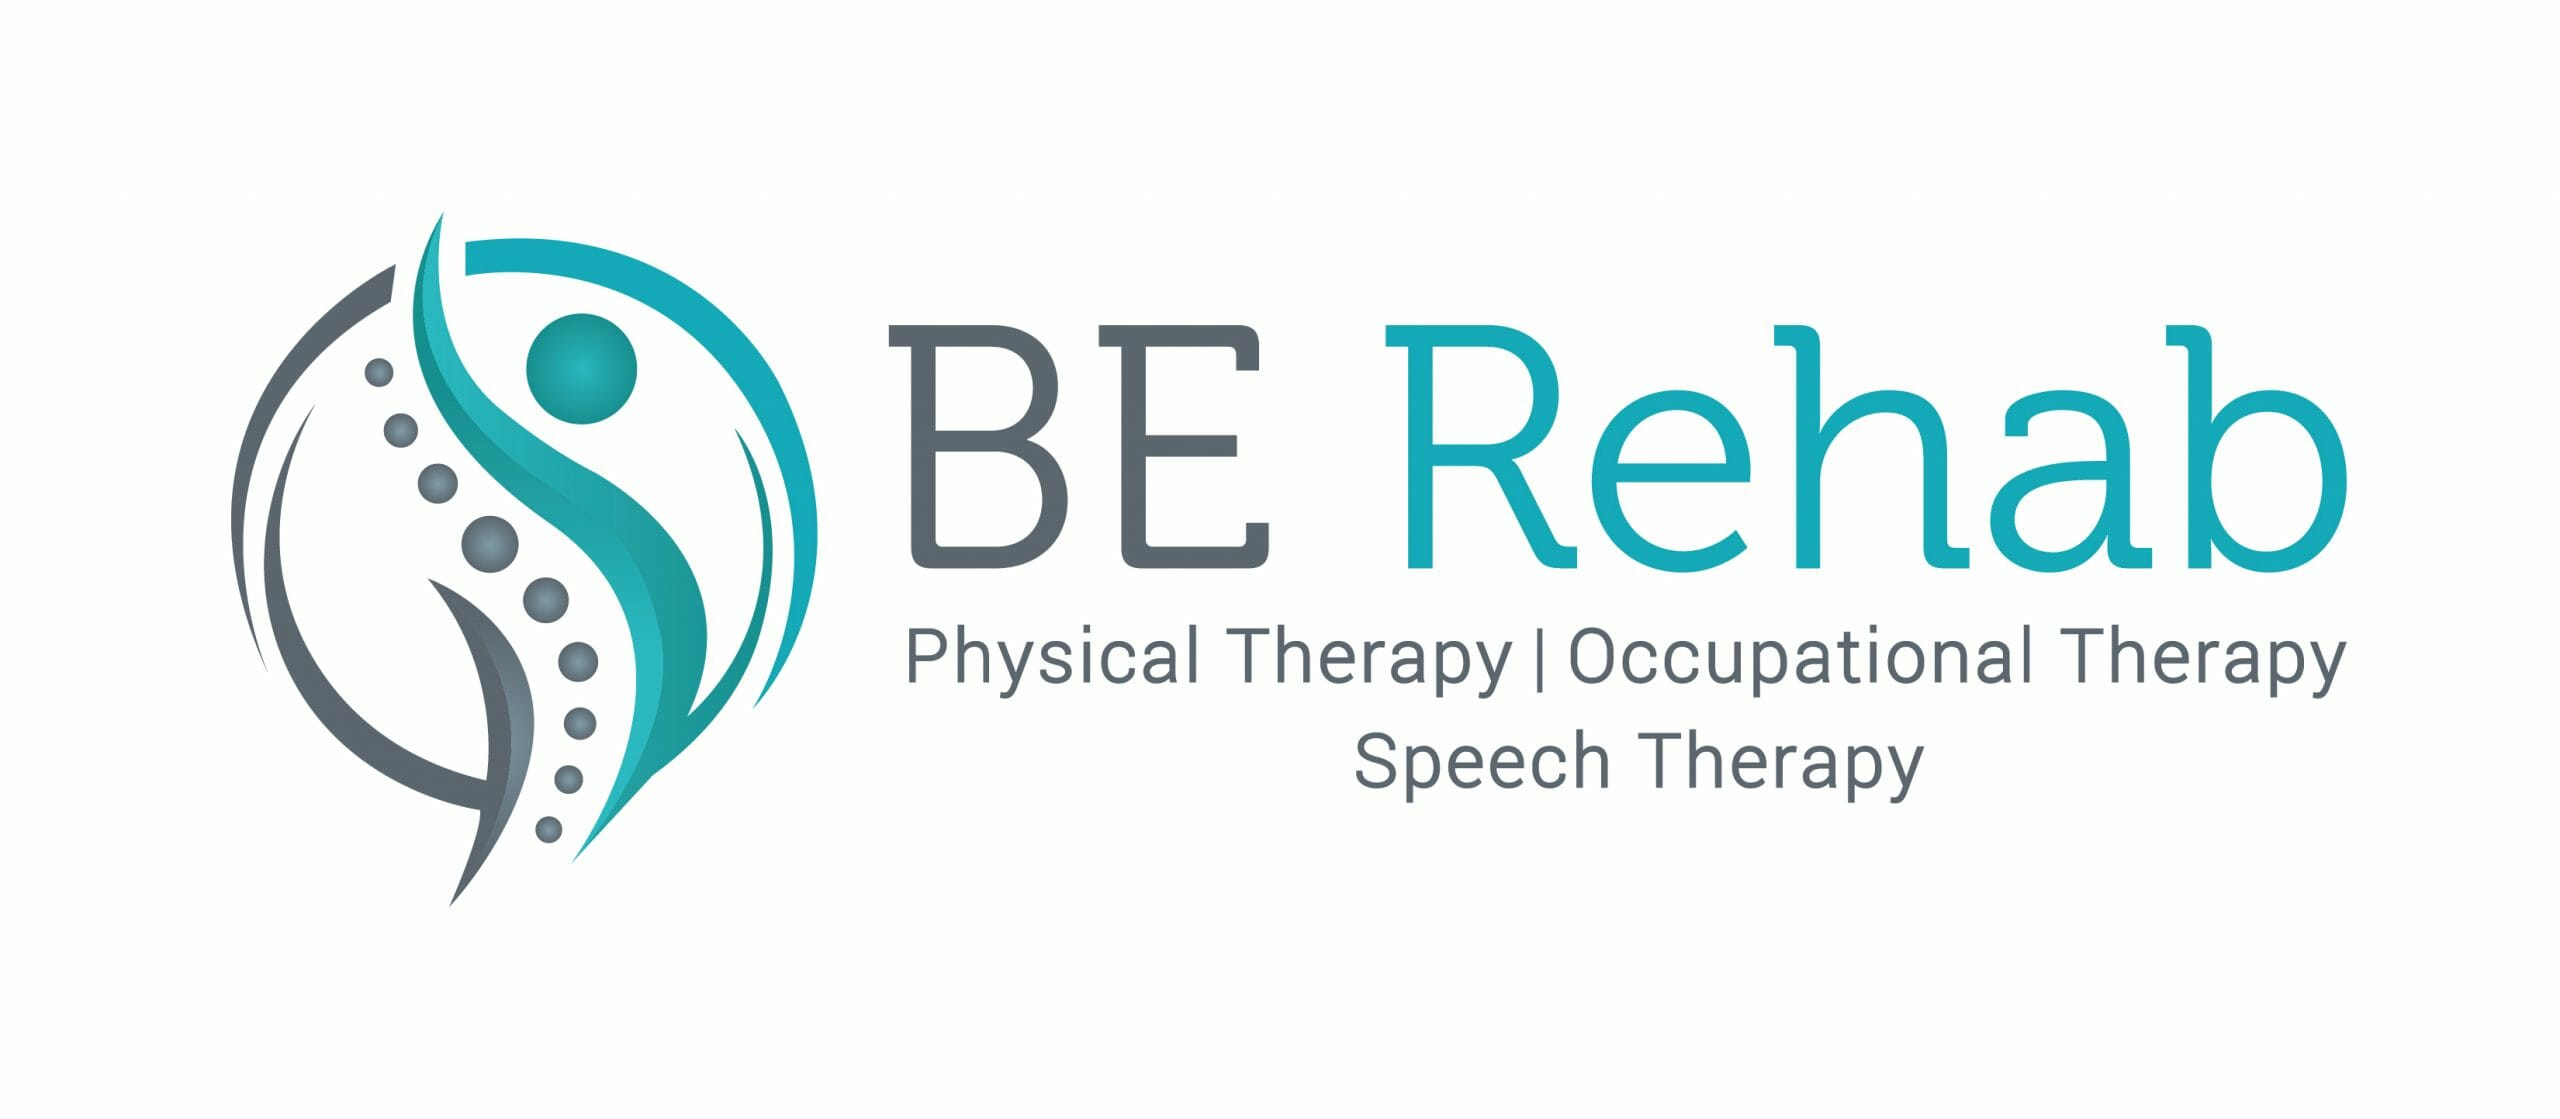 BE Rehab – Rehabilitation Services At Home*